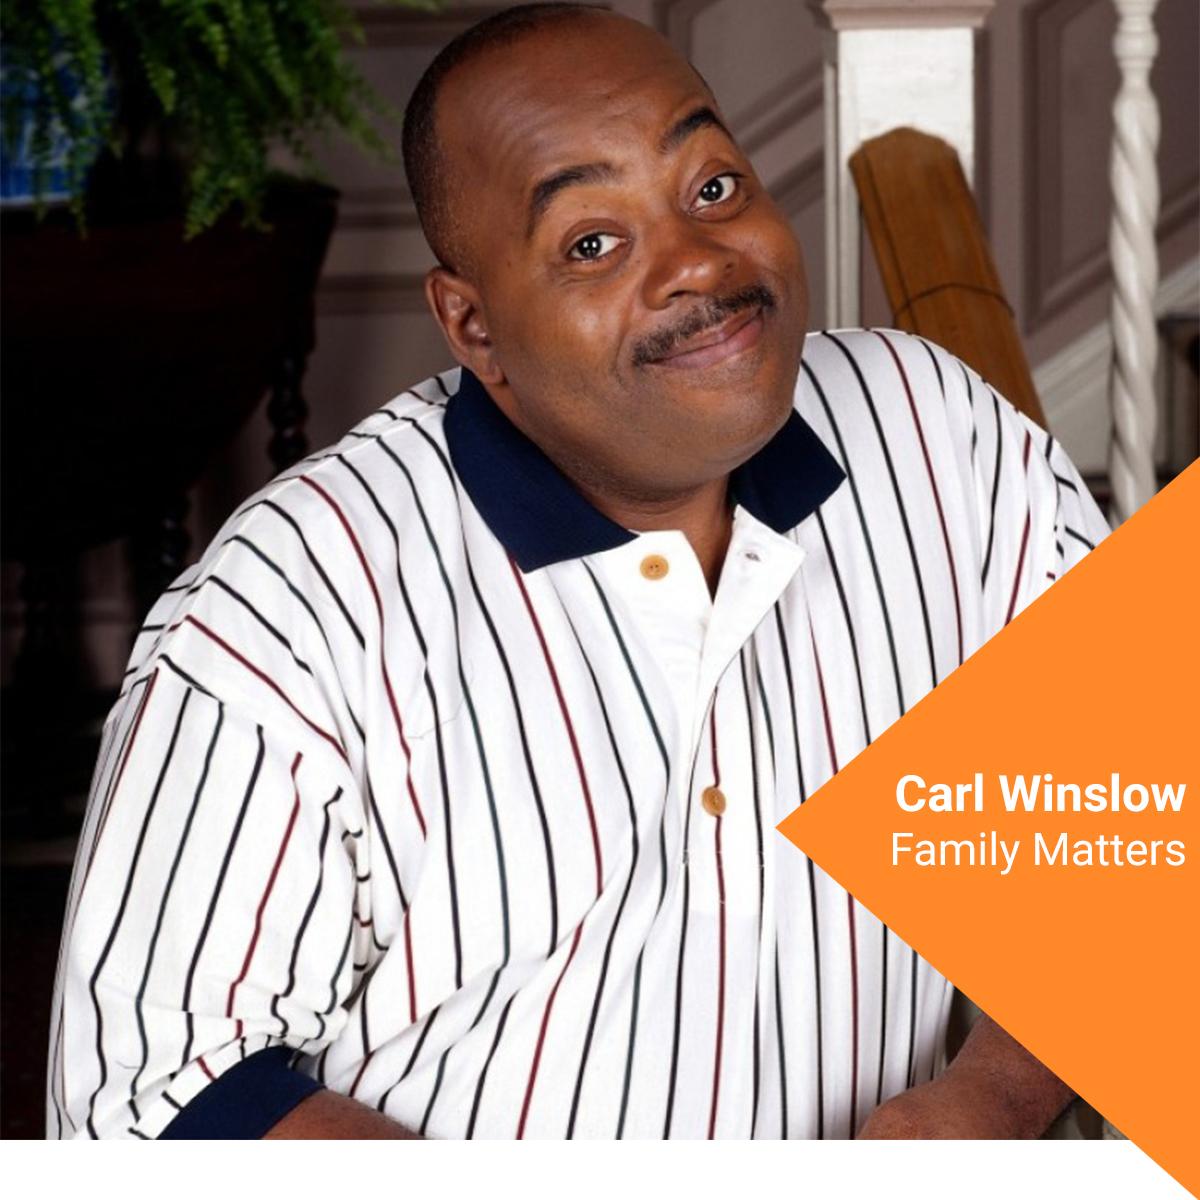 Image of Carl Winslow